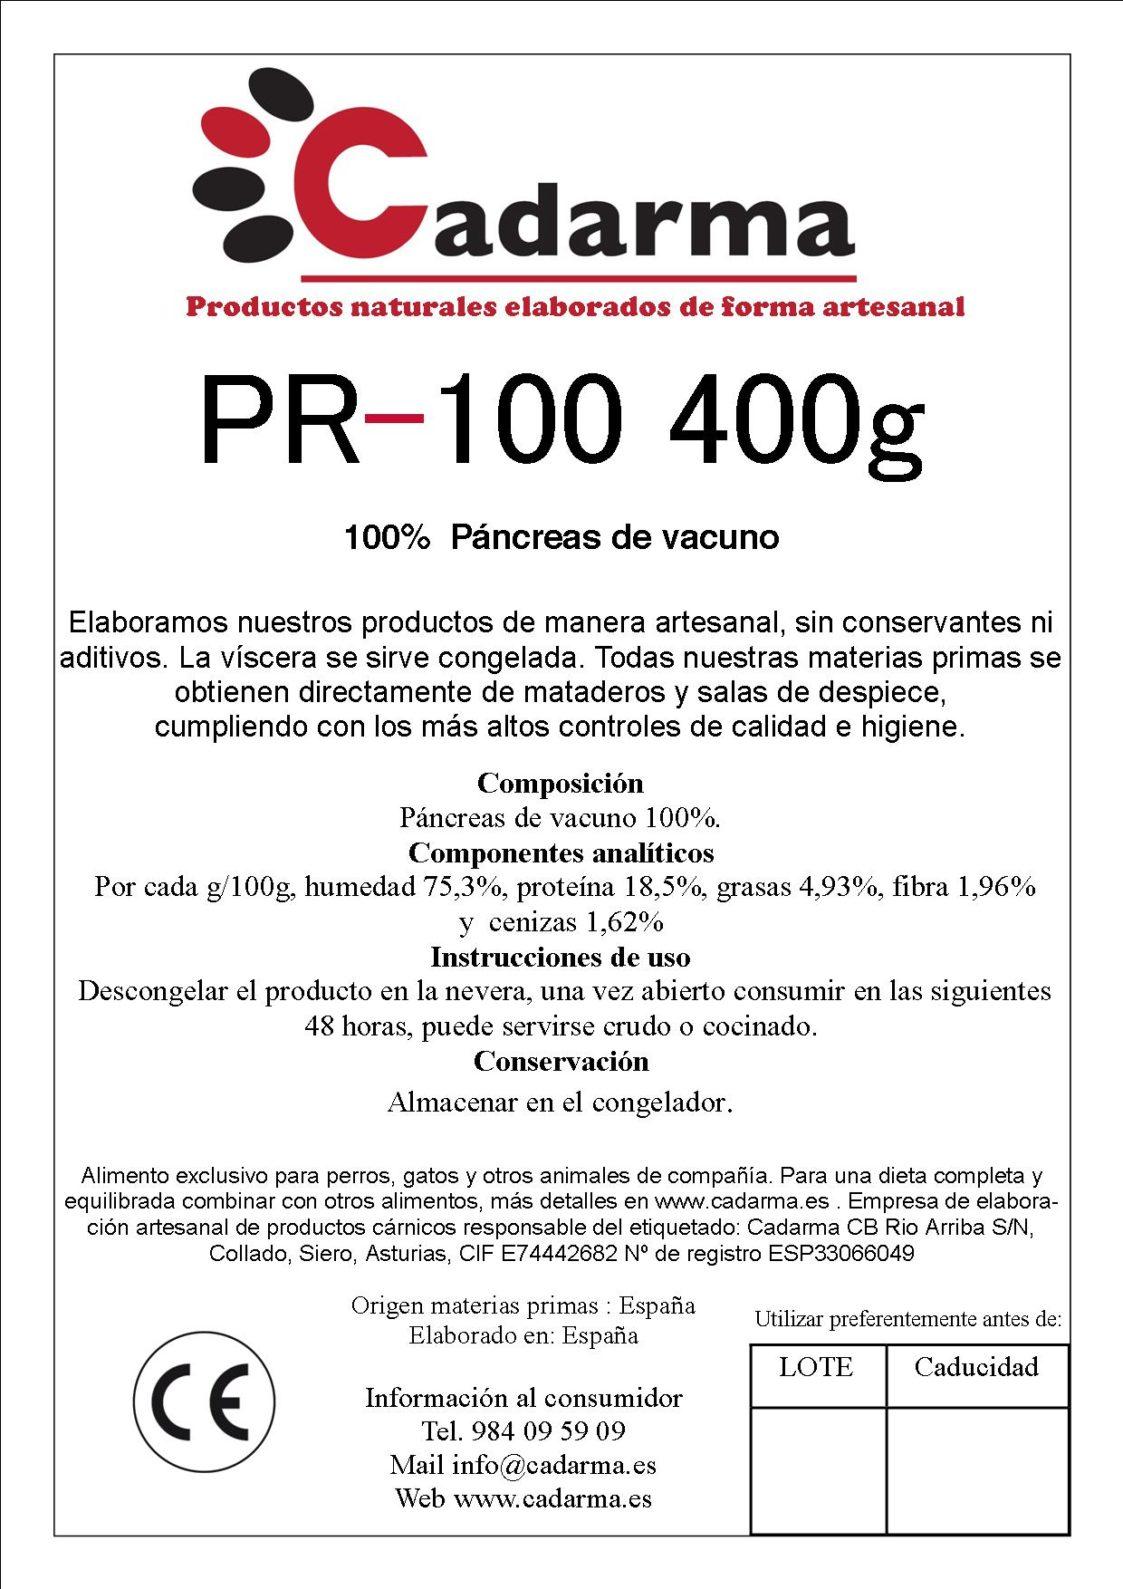 PR-100 400g